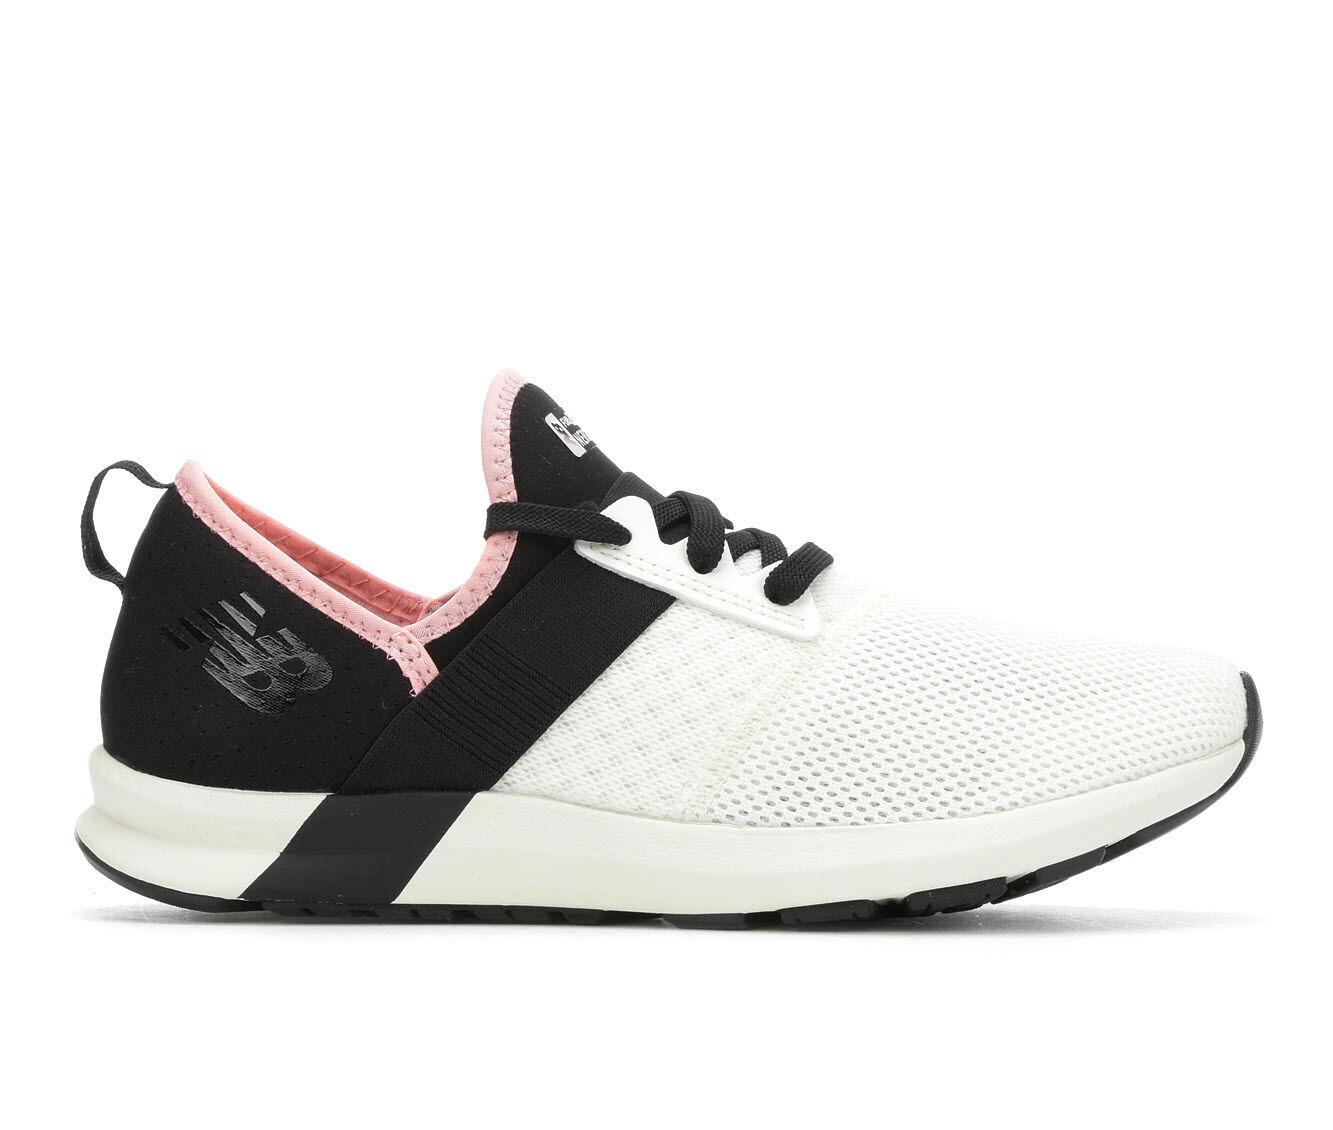 uk shoes_kd4546